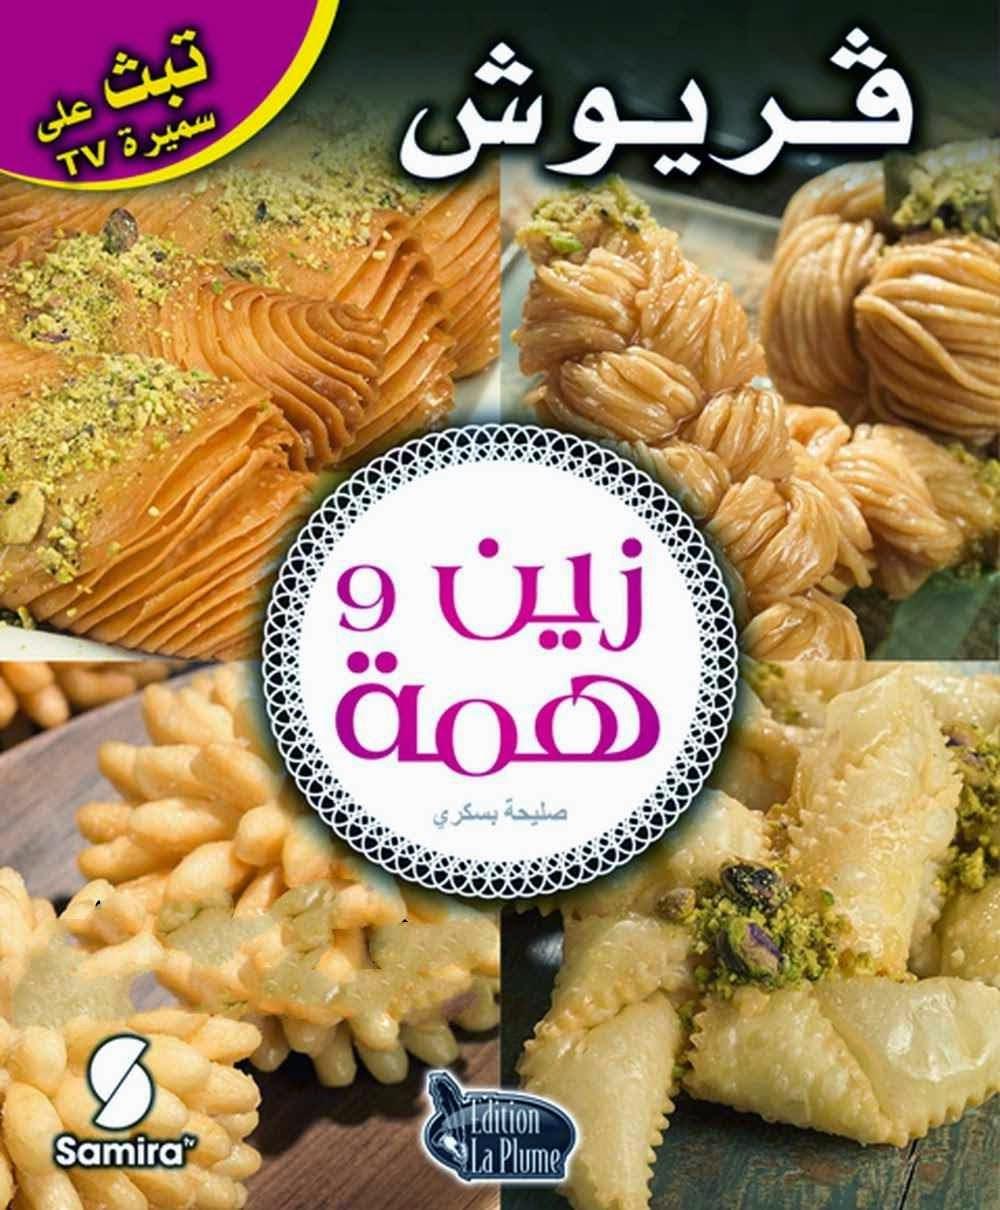 Gateaux Oum Walid Samira Tv: تحميل كتب الطبخ